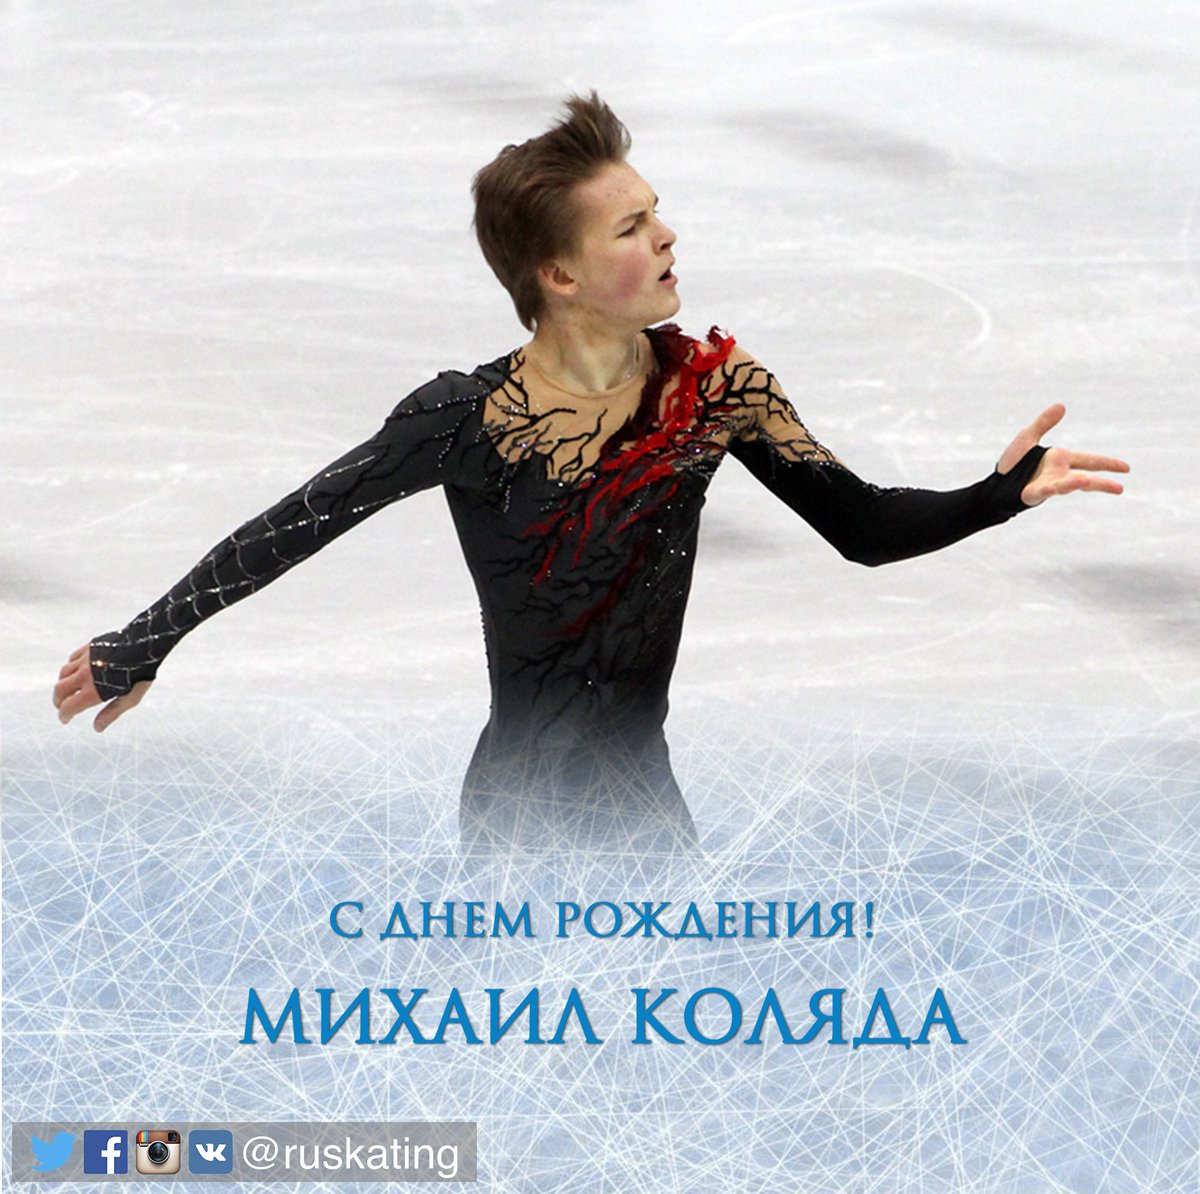 Михаил Коляда - Страница 3 Cbe3EBtW4AA-lEq